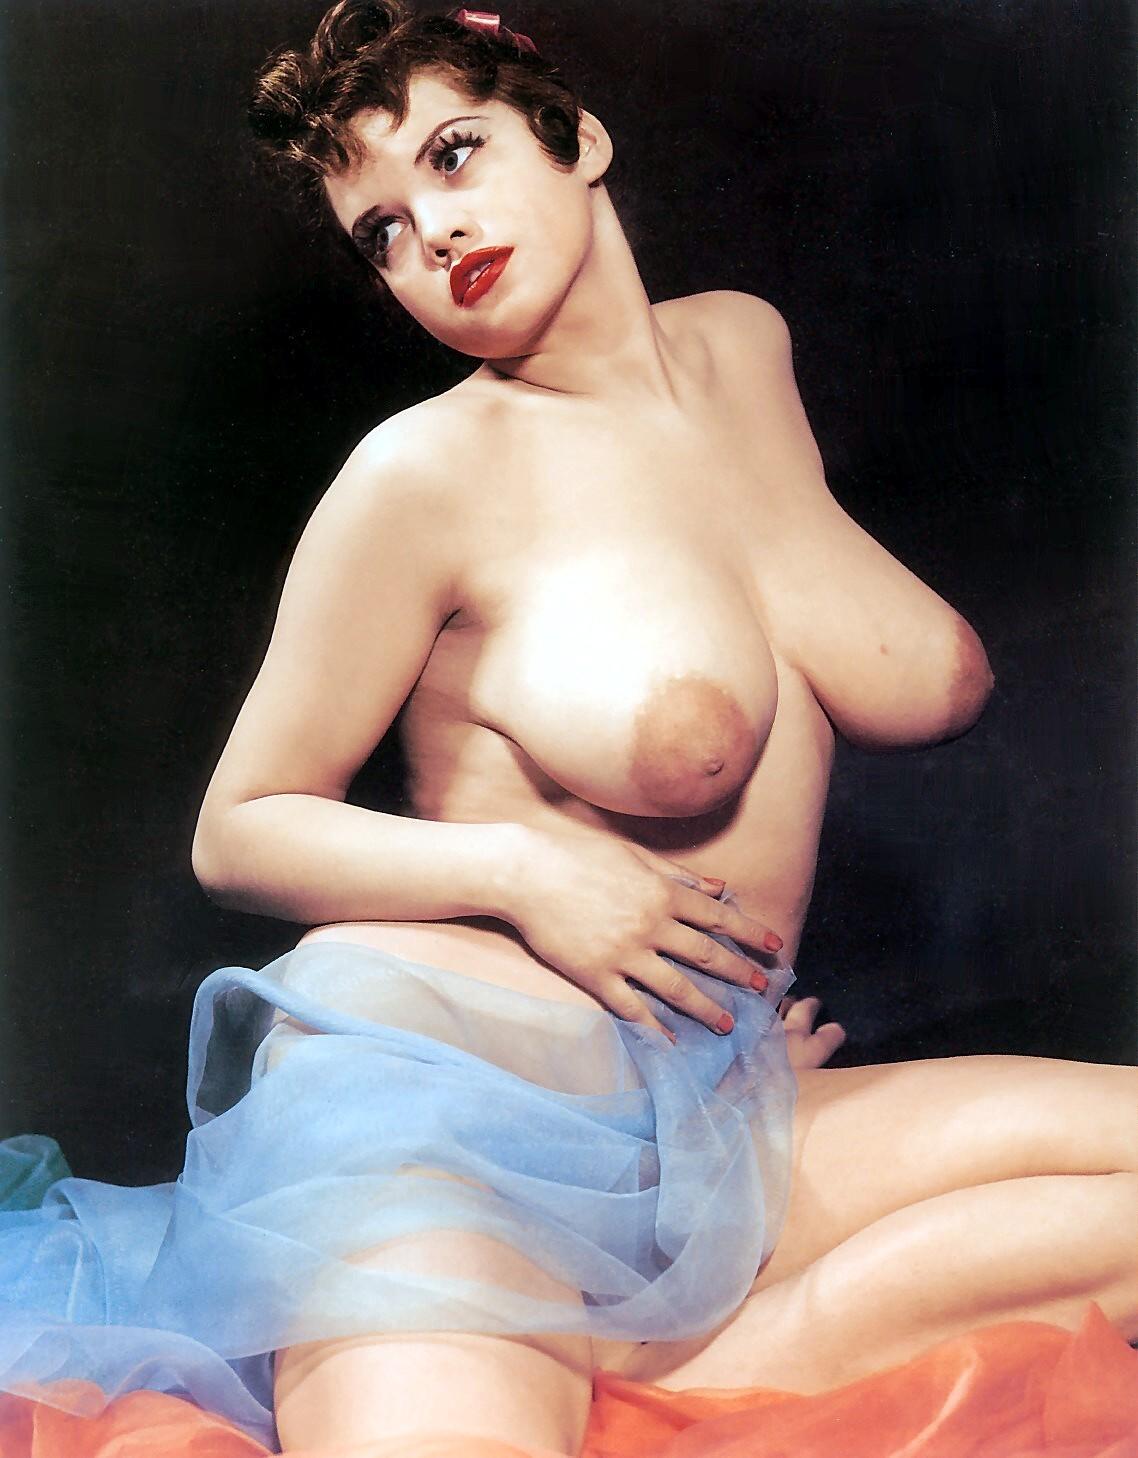 vintage-small-boobs